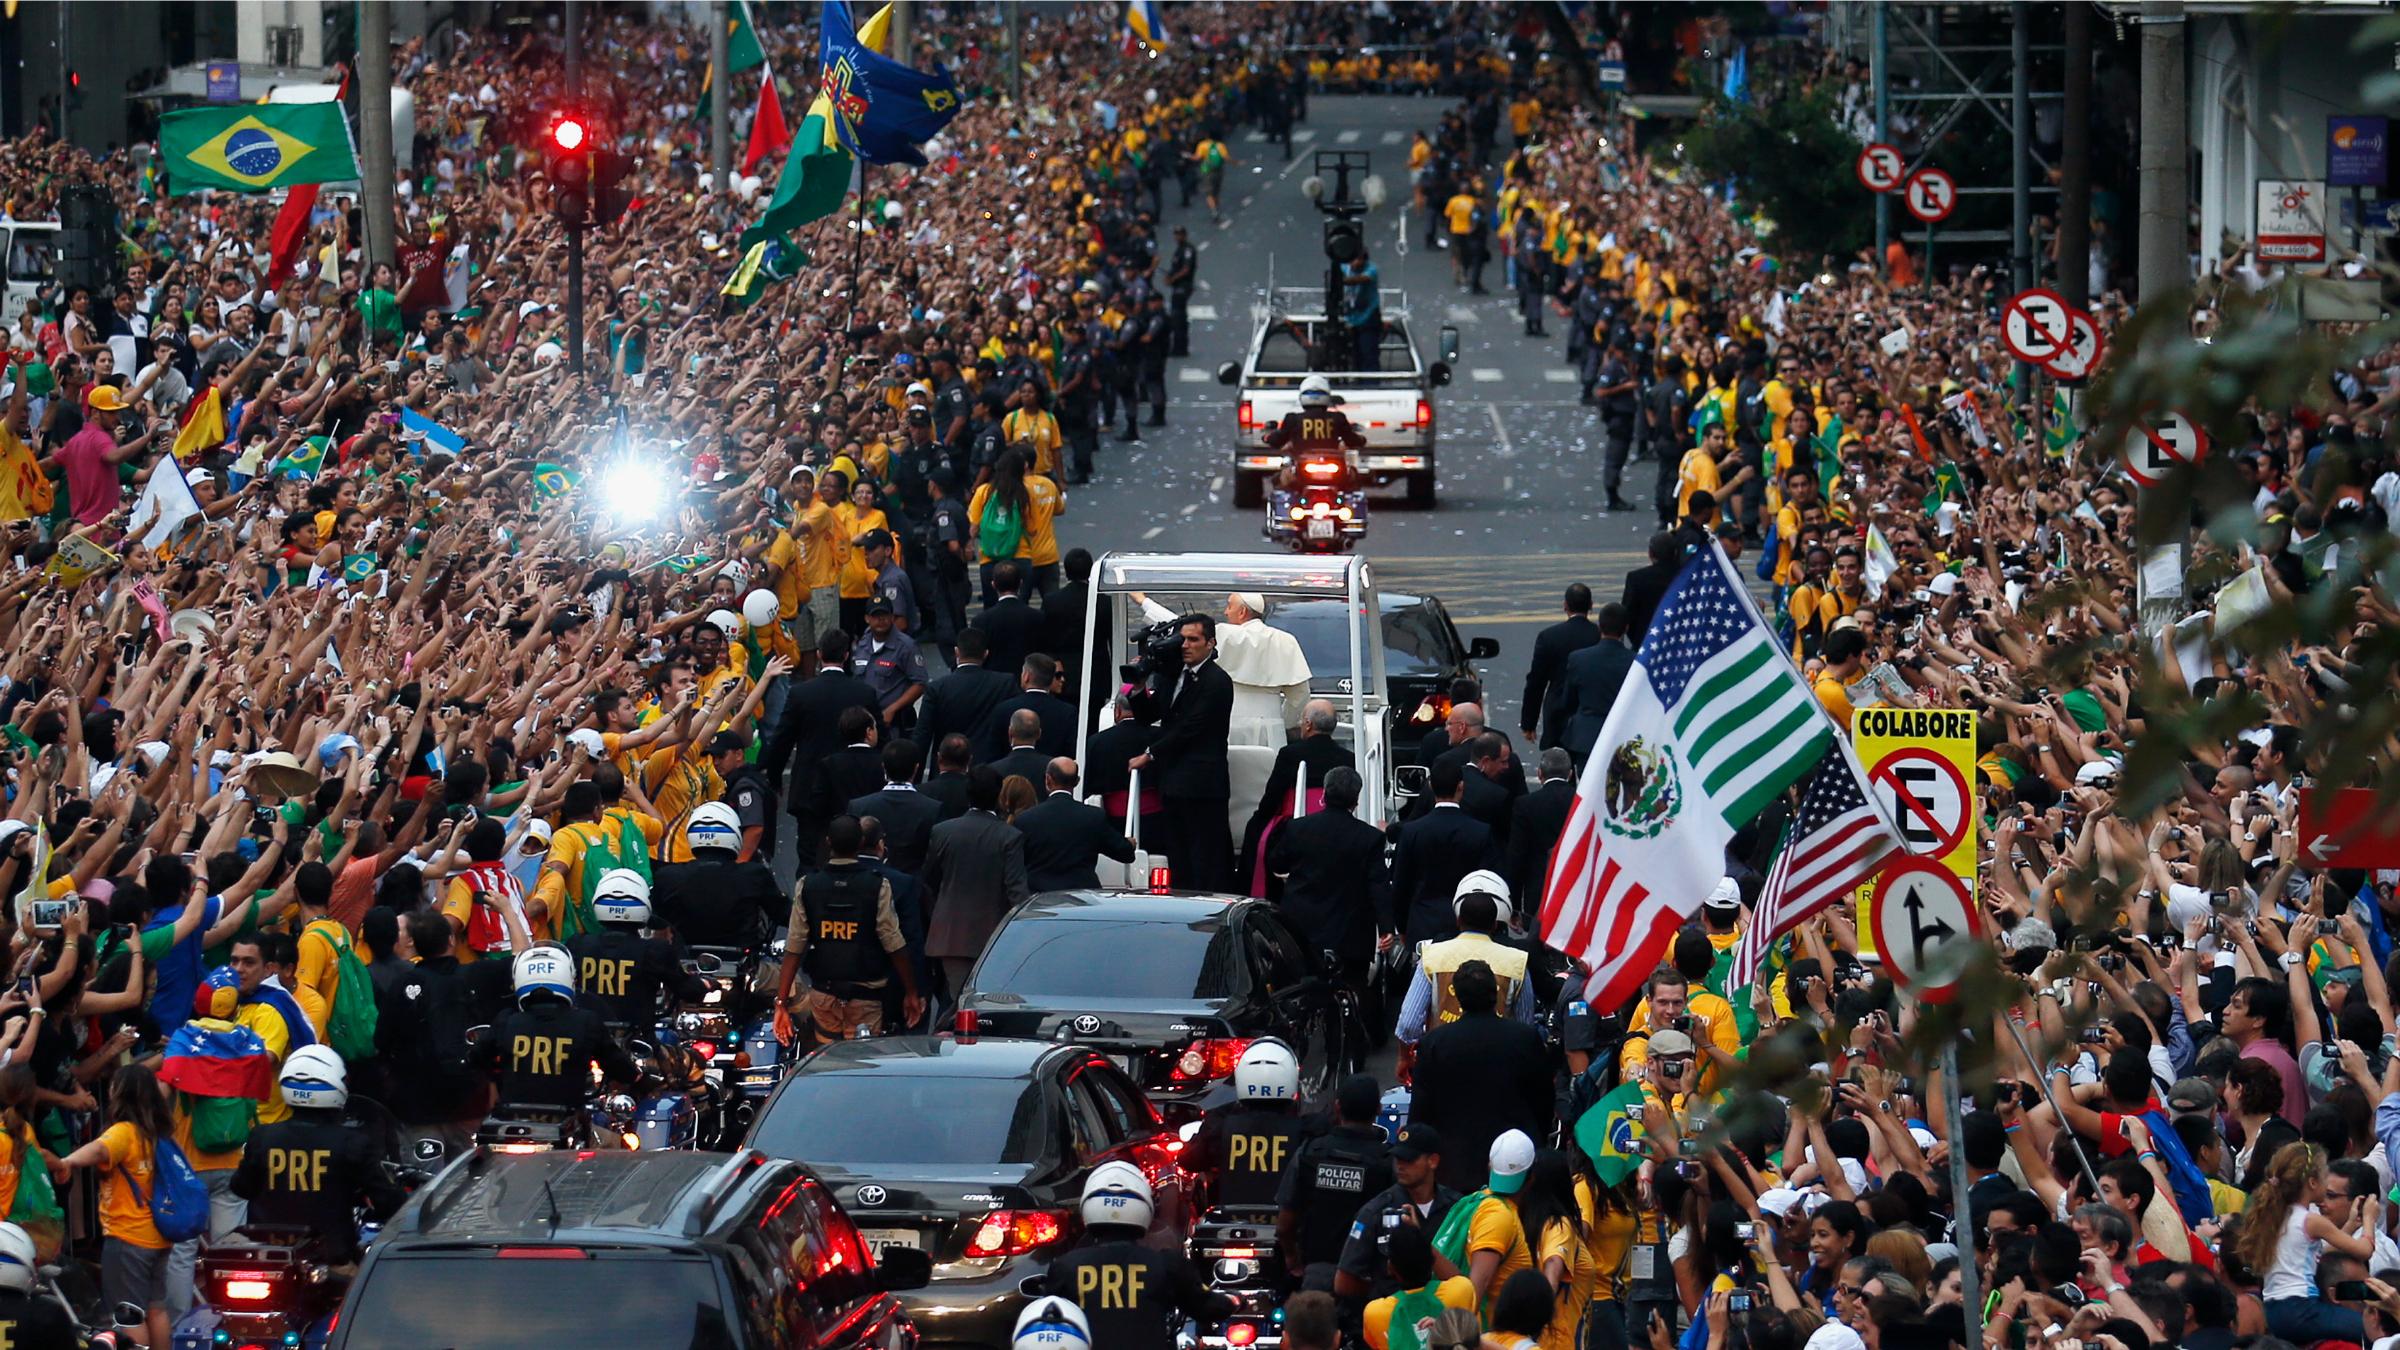 Pope Francis Brazil